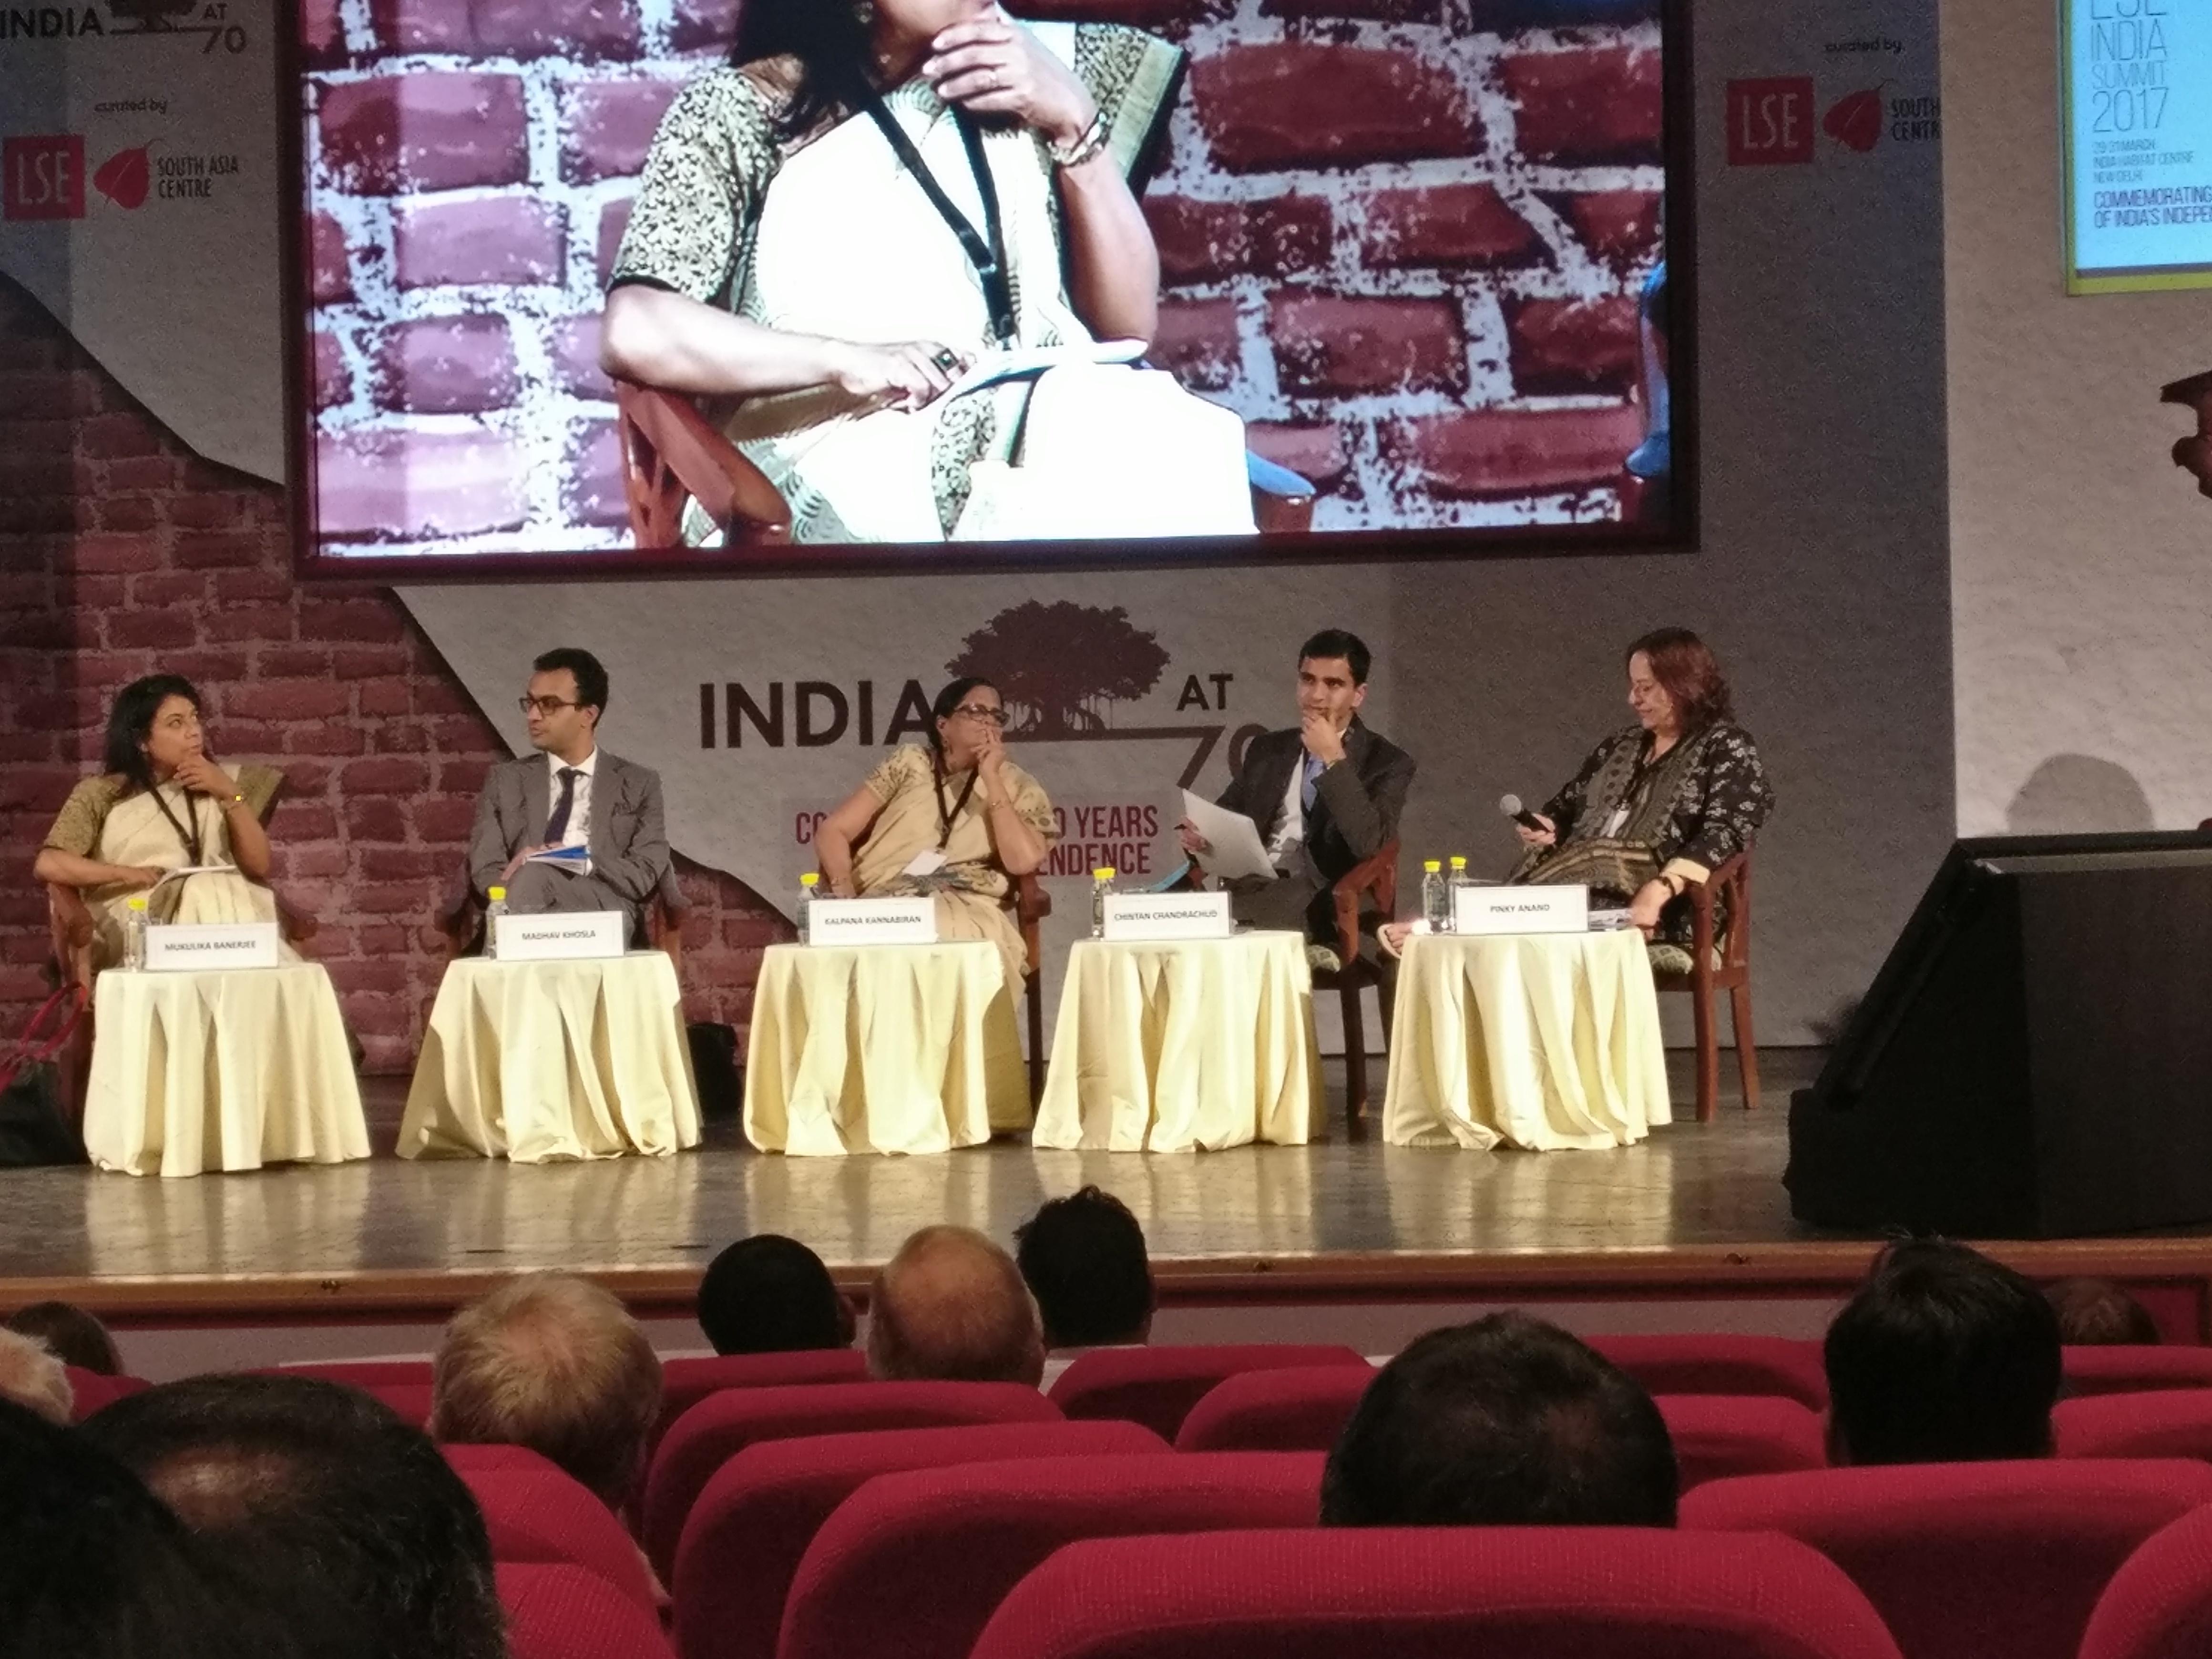 From left: Mukulika Banerjee (moderator), Madhav Khosla, Kalpana Kannabiran, Chintan Chandrachud and Pinky Anand.